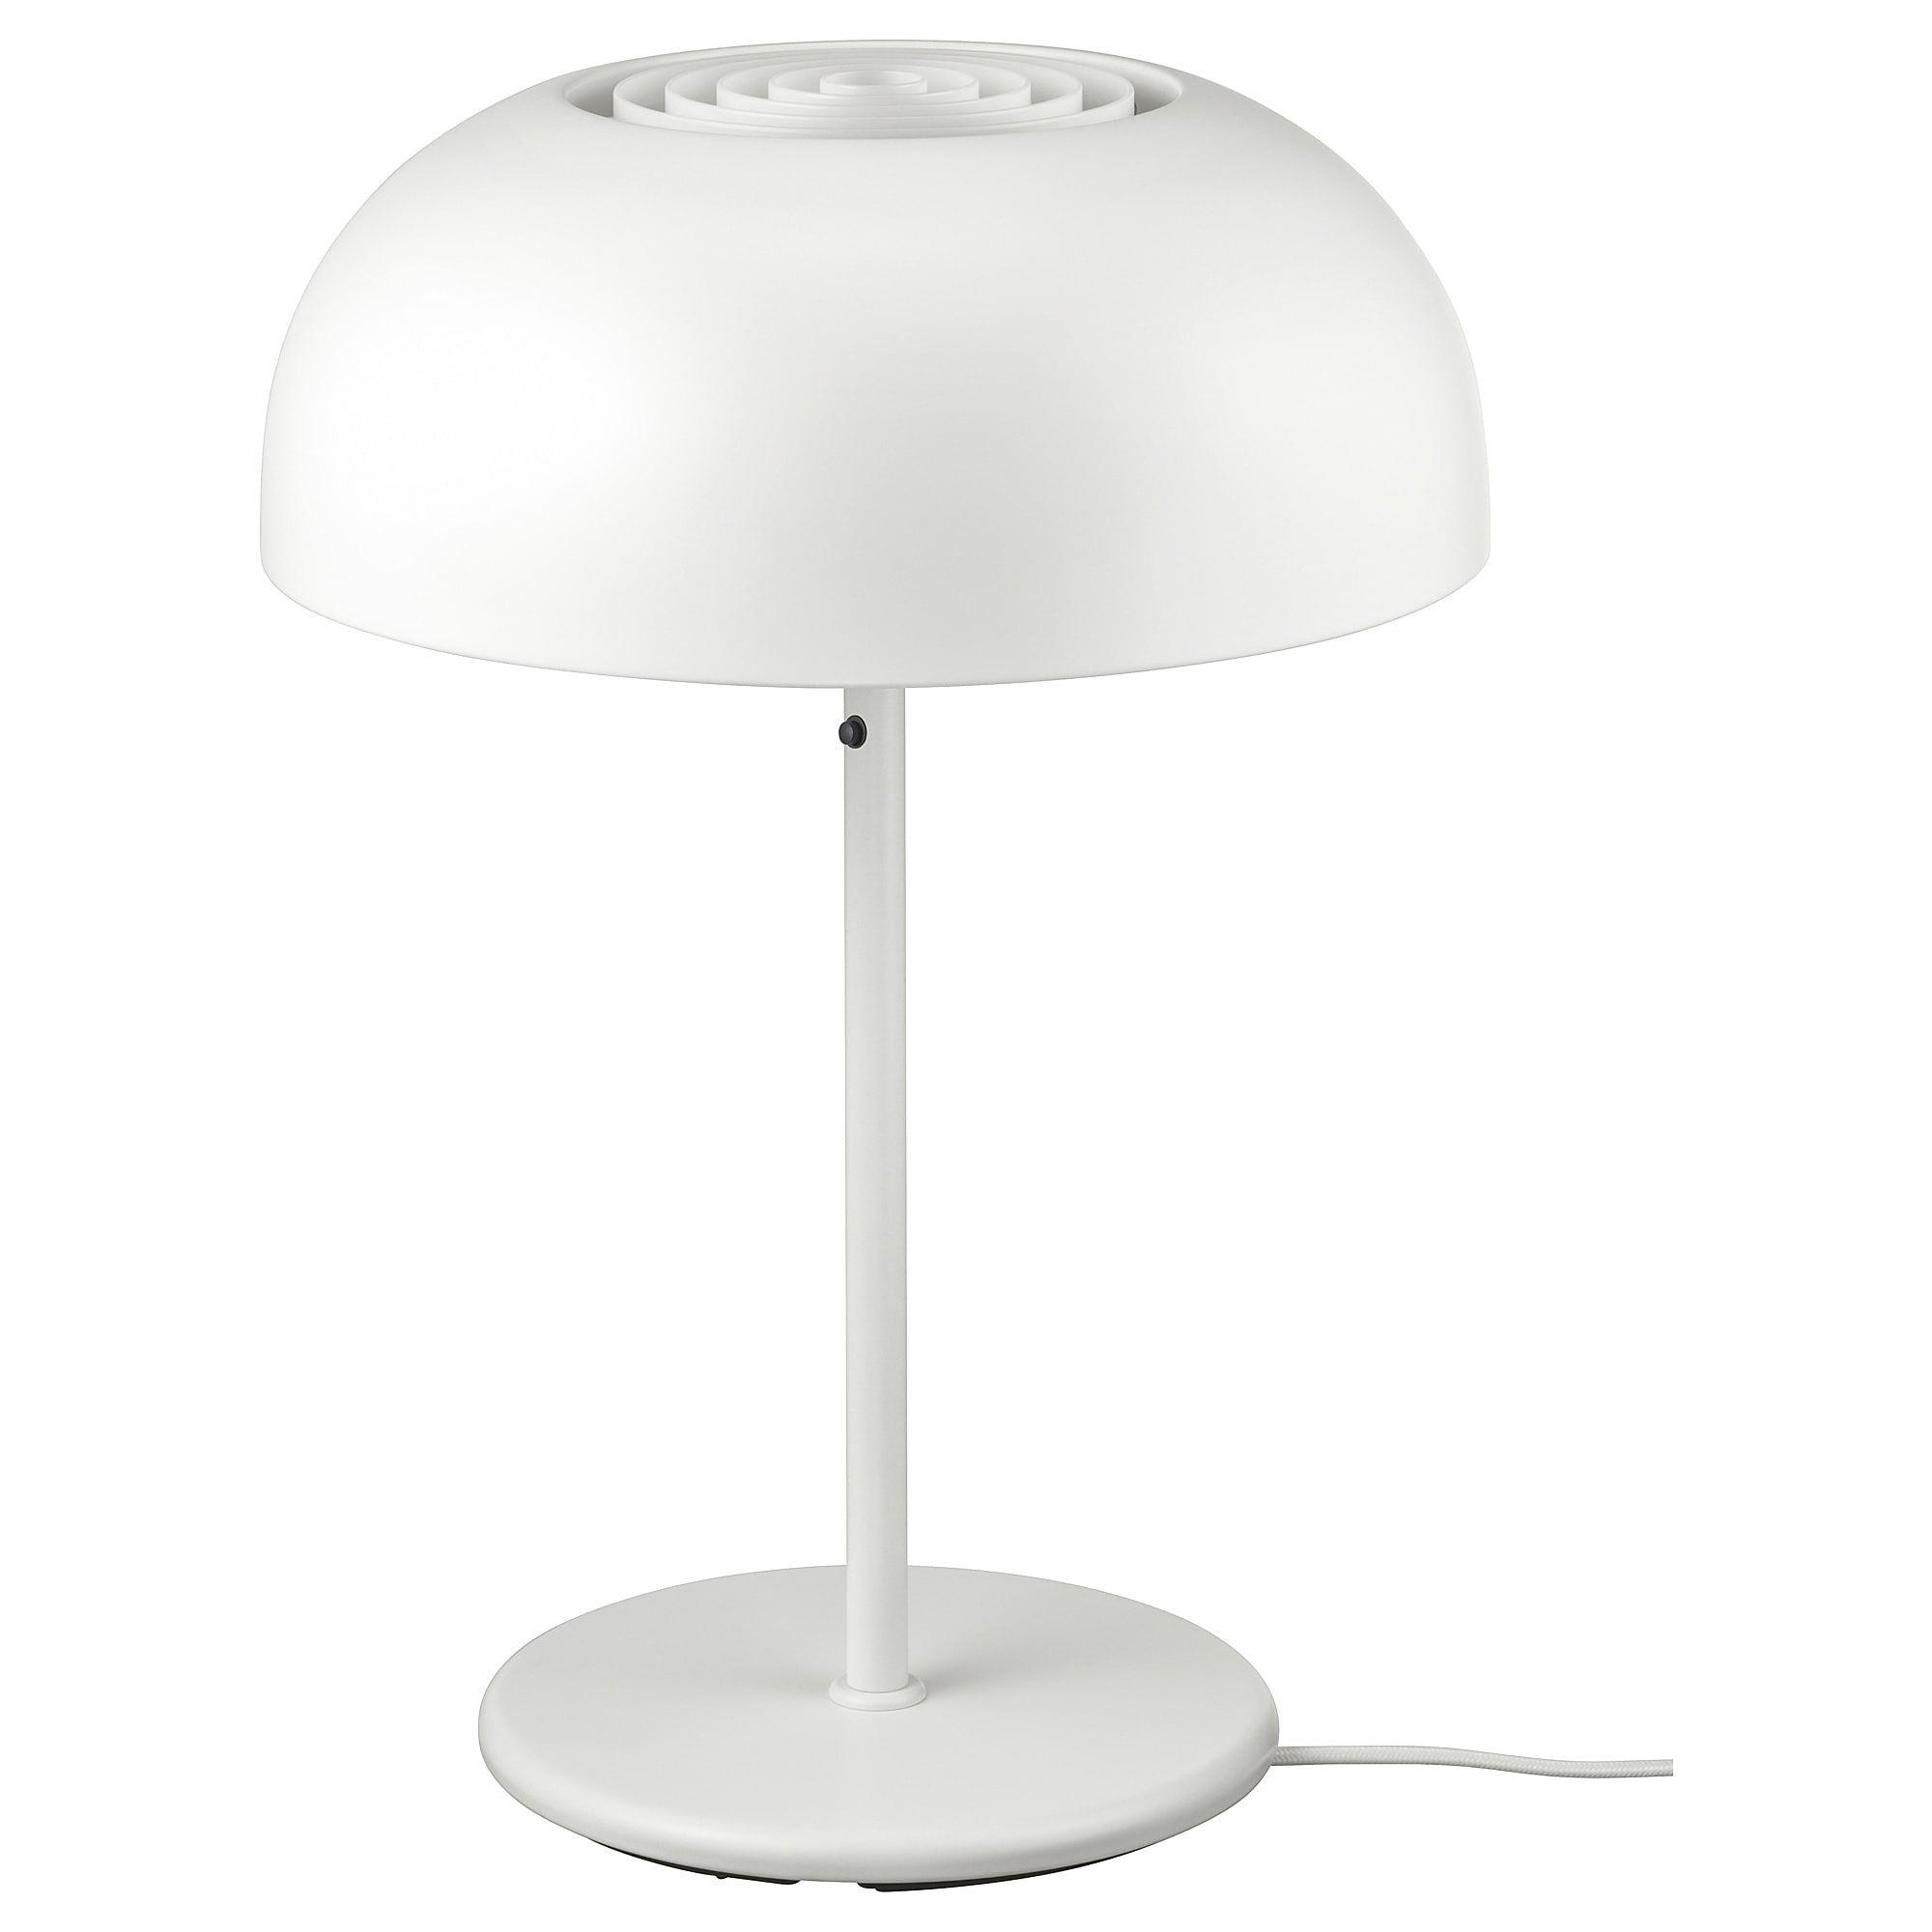 Nymane Table Lamp White Ikea Table Lamp Lamp White Table Lamp